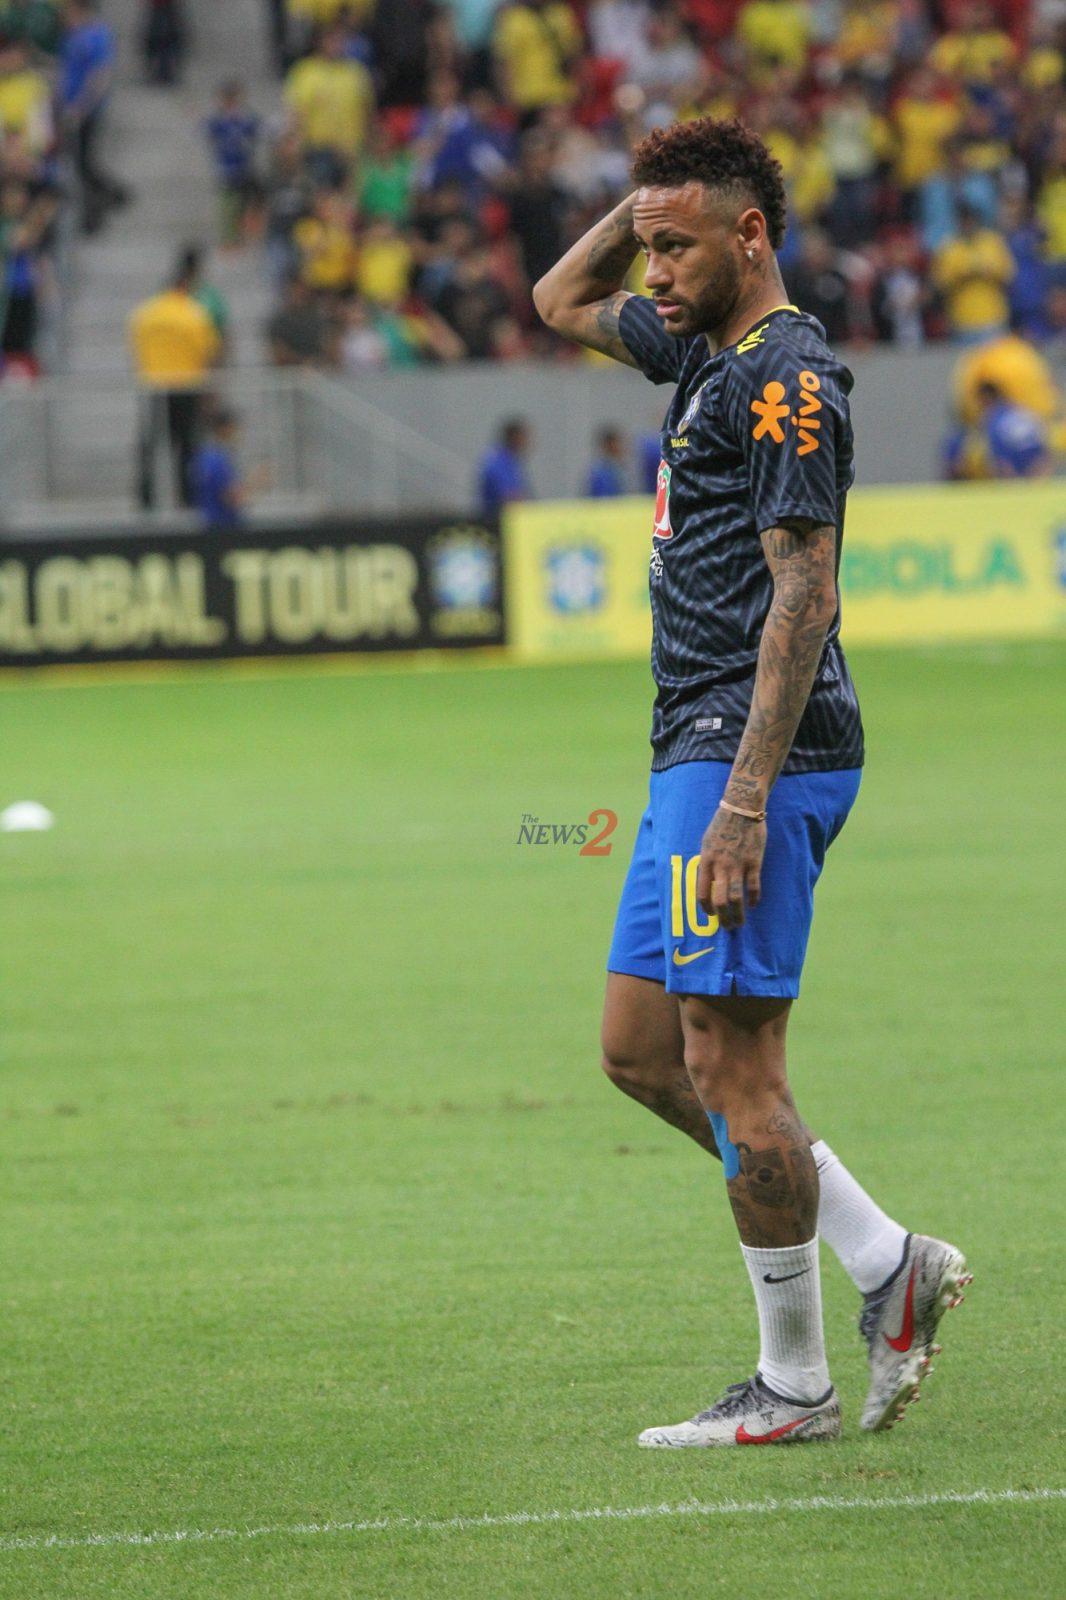 Neymar is cut off from Copa America 2019